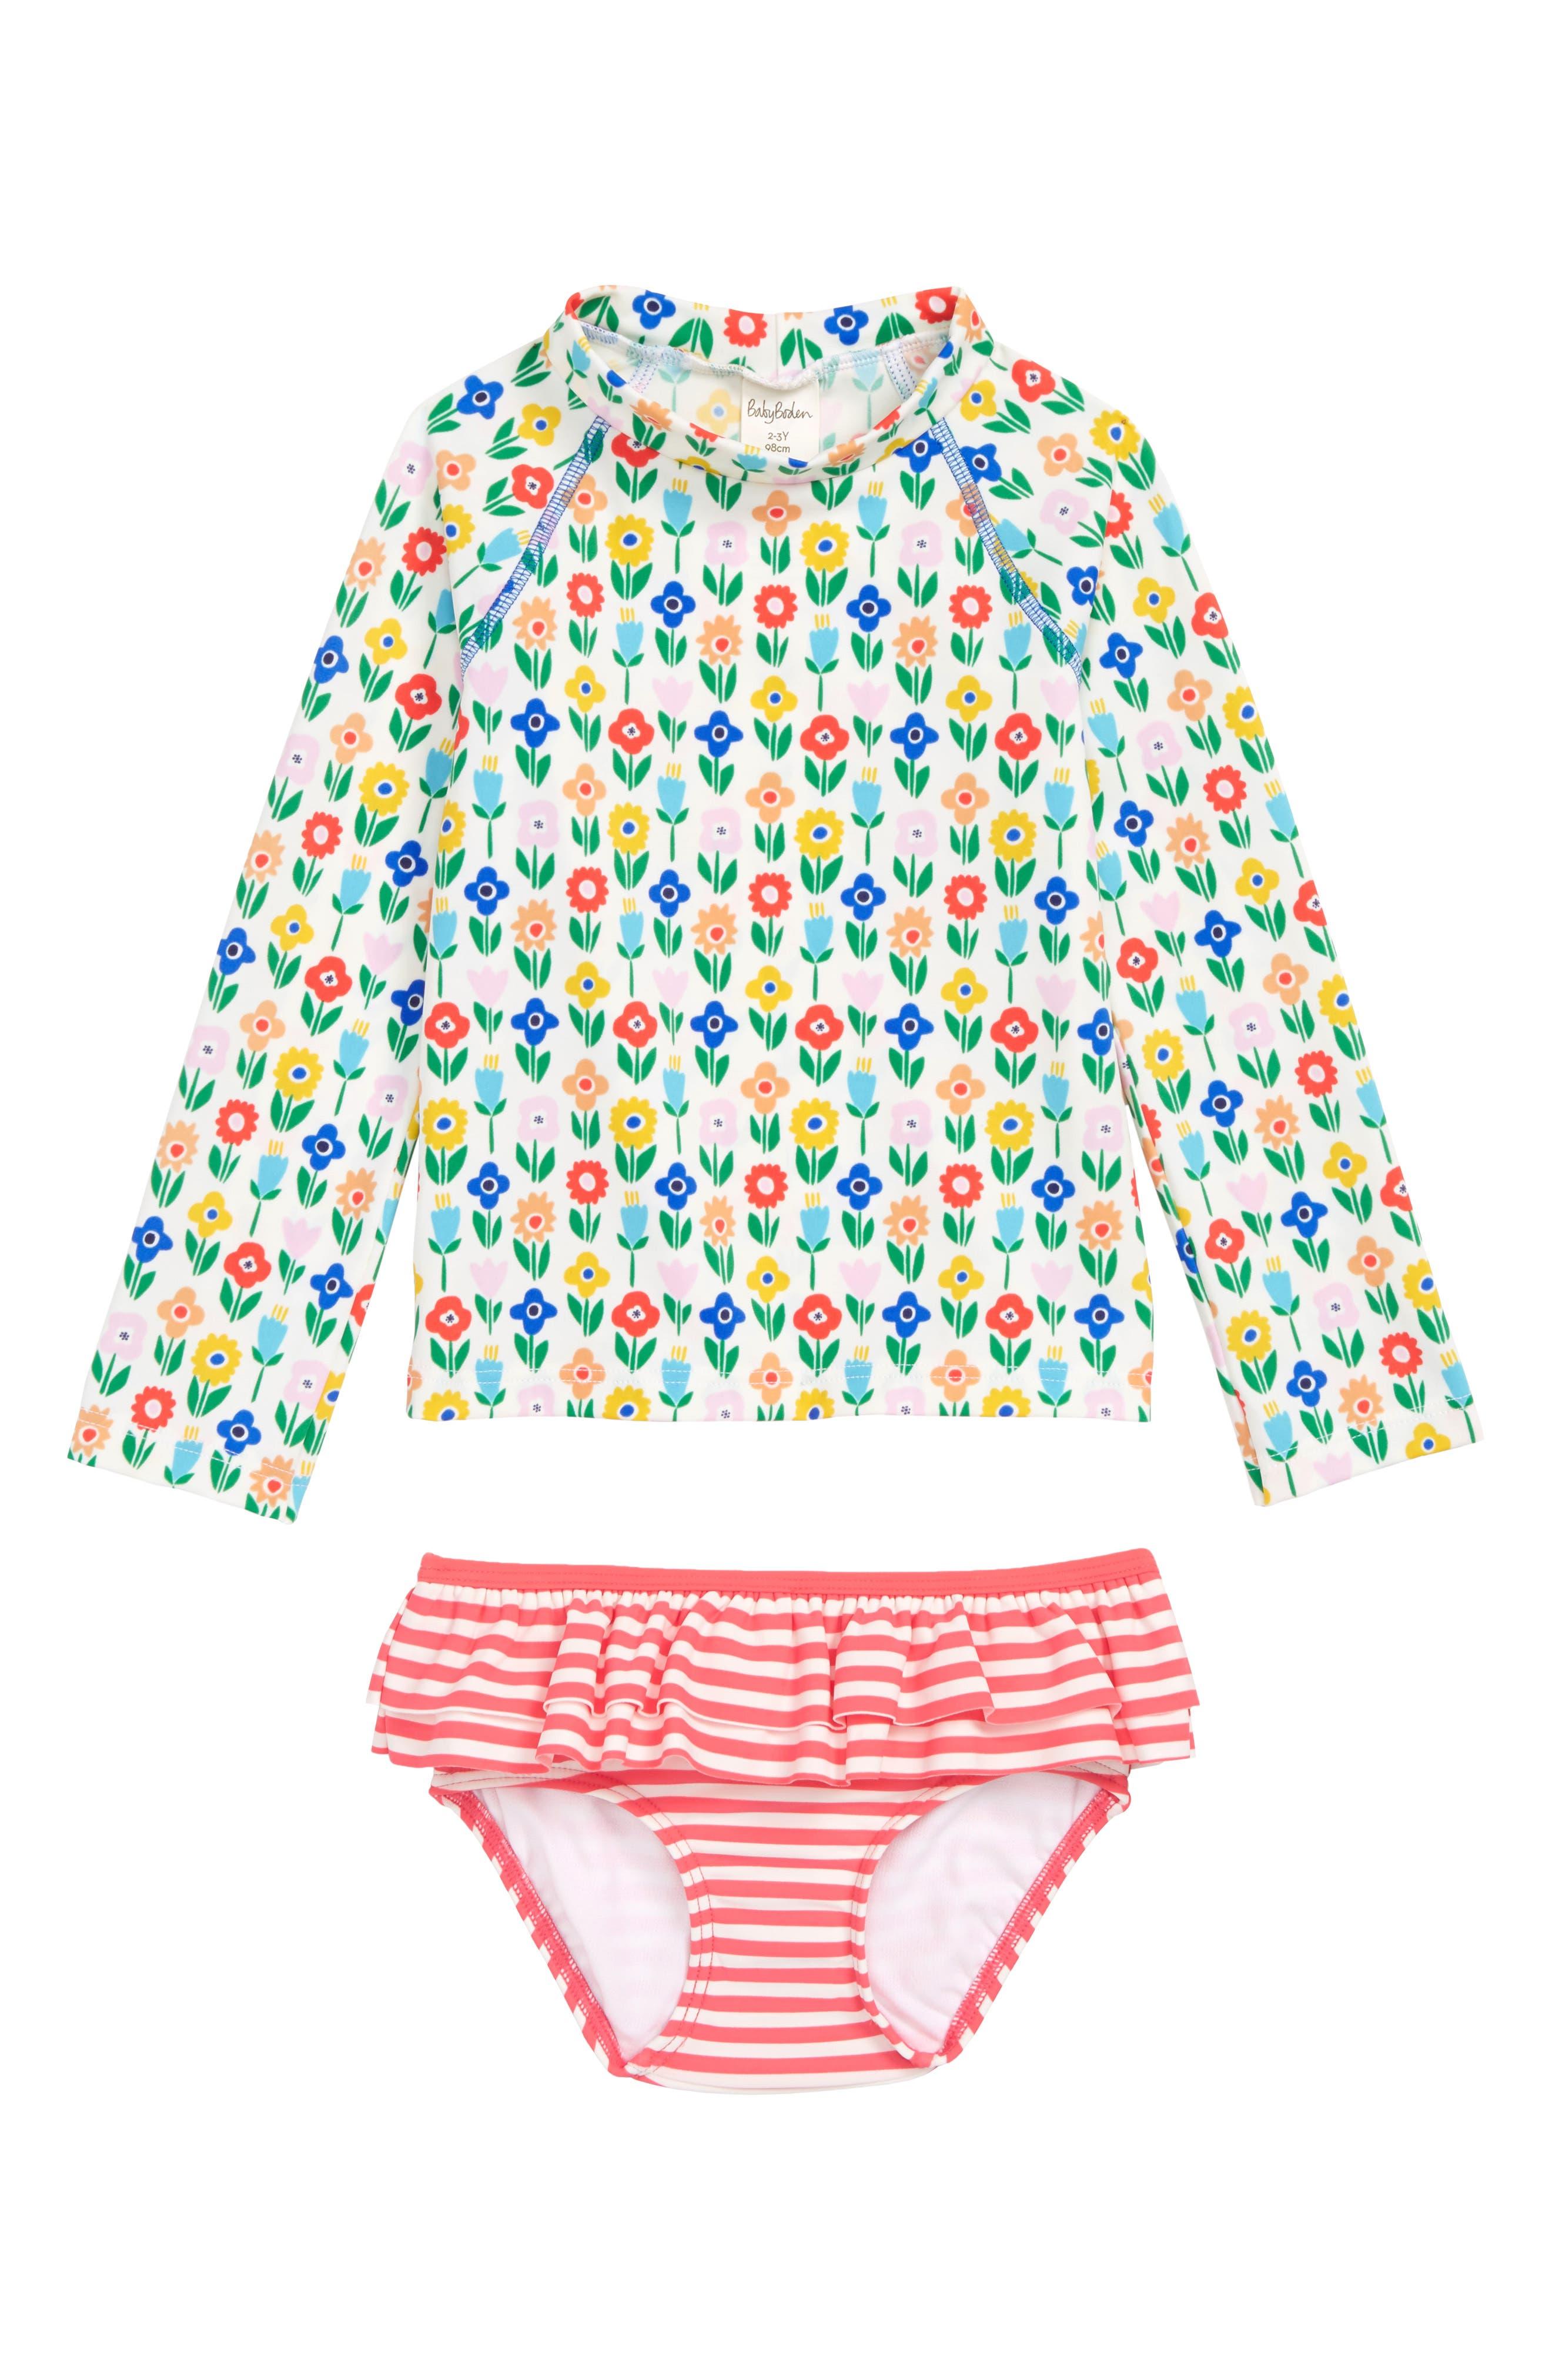 MINI BODEN,                             Two-Piece Rashguard Swimsuit,                             Main thumbnail 1, color,                             PNT MULTI BABY FLOWER PATCH